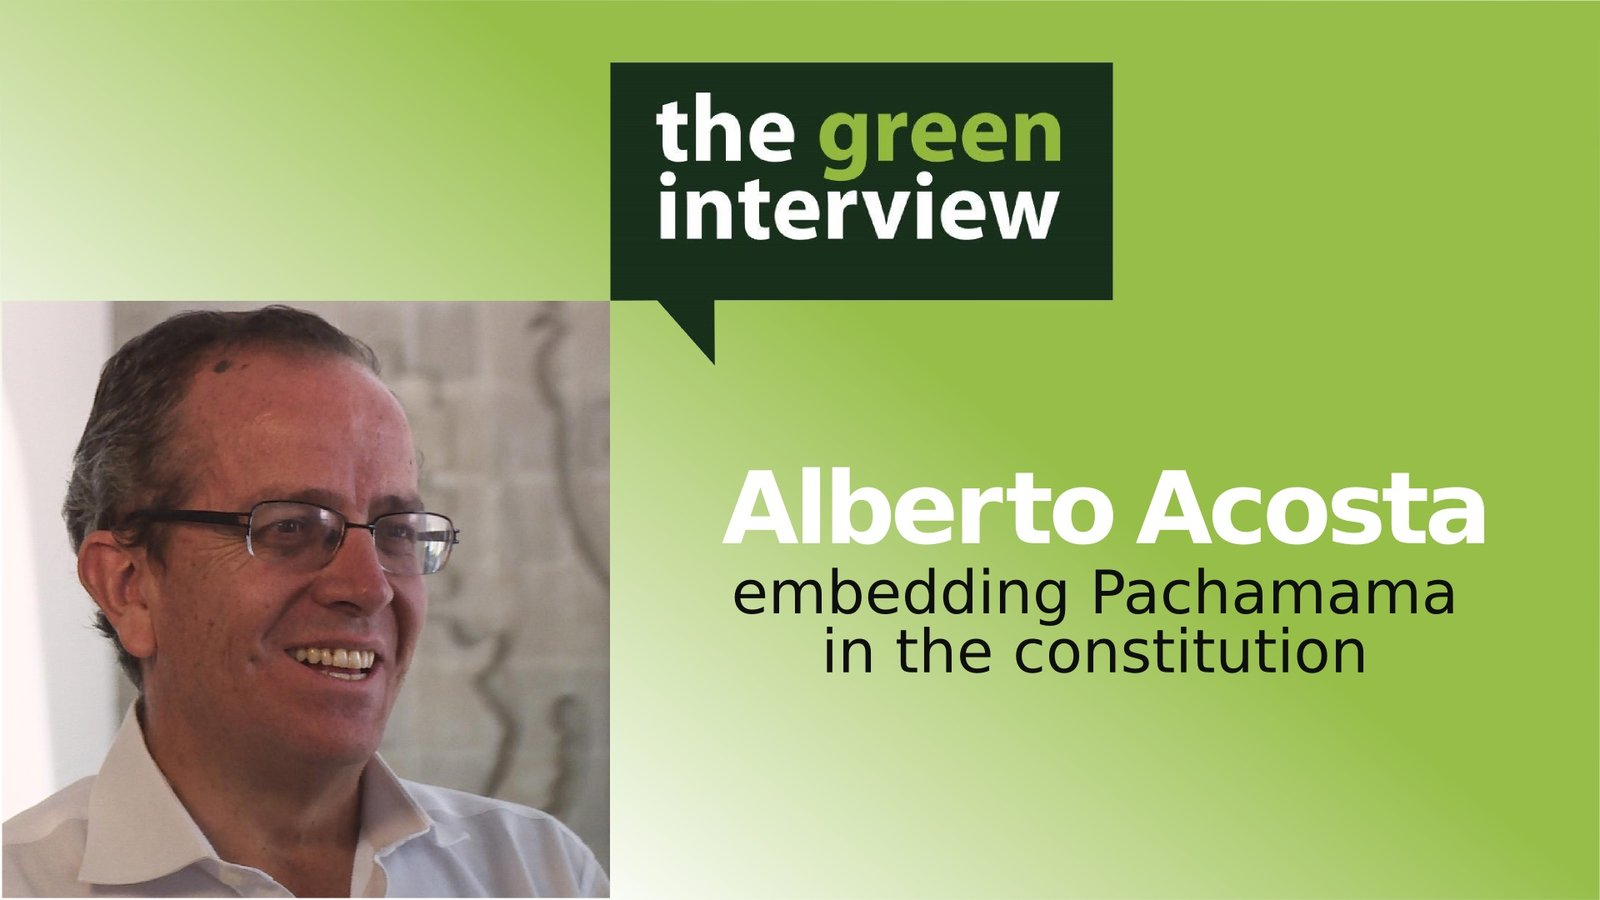 Alberto Acosta: Embedding Pachama in the Constitution